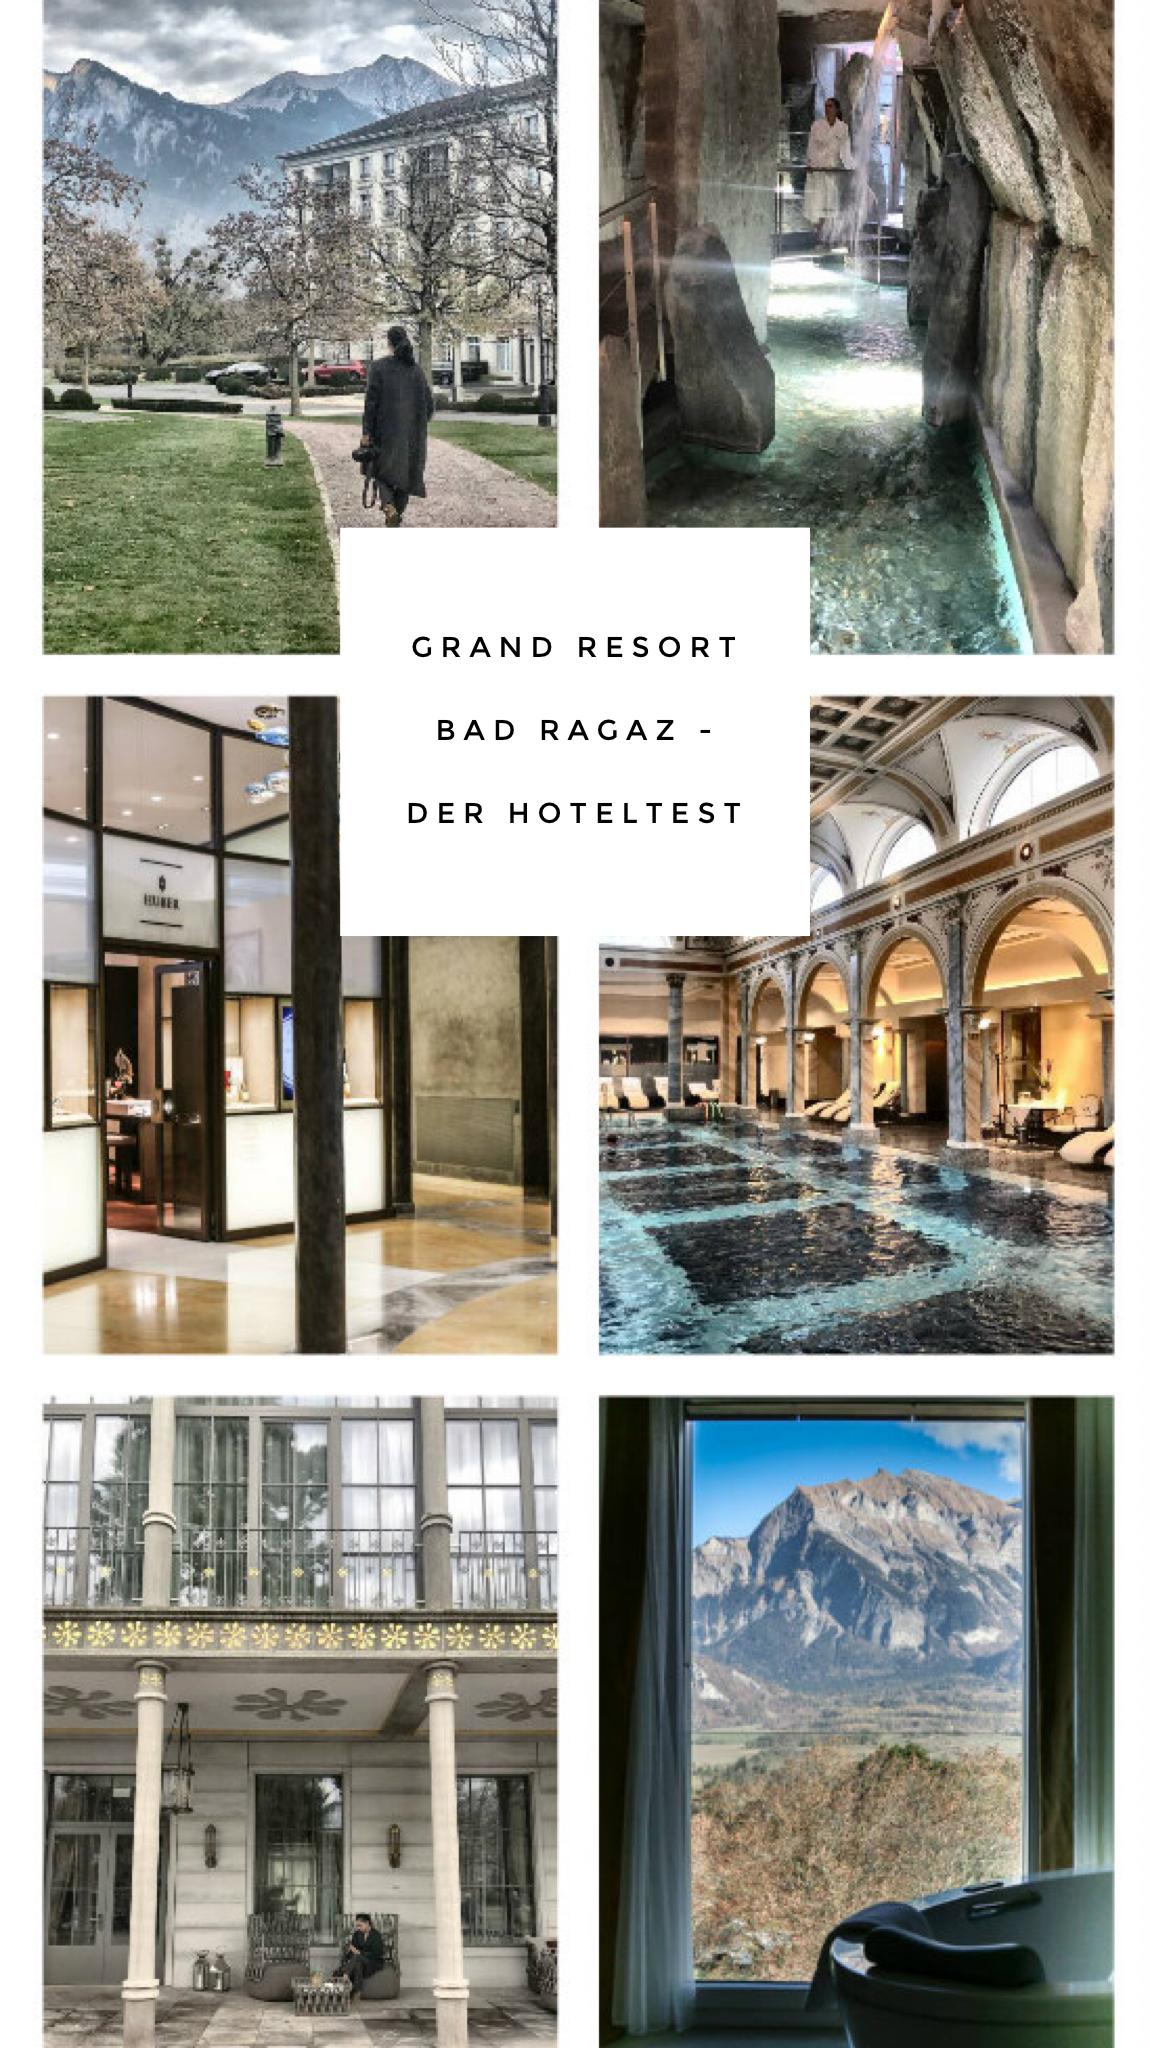 Hoteltest Grand Resort Bad Ragaz